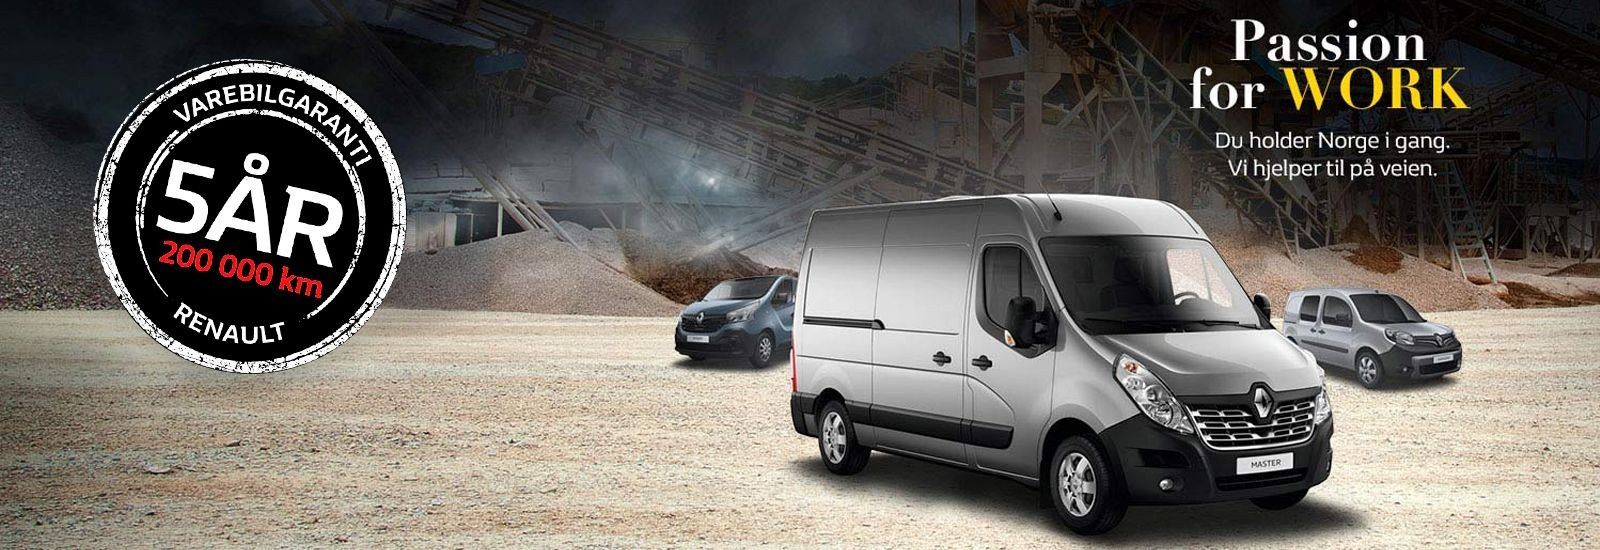 Renault MASTER - Motor Forum - Autorisert Renault-forhandler og